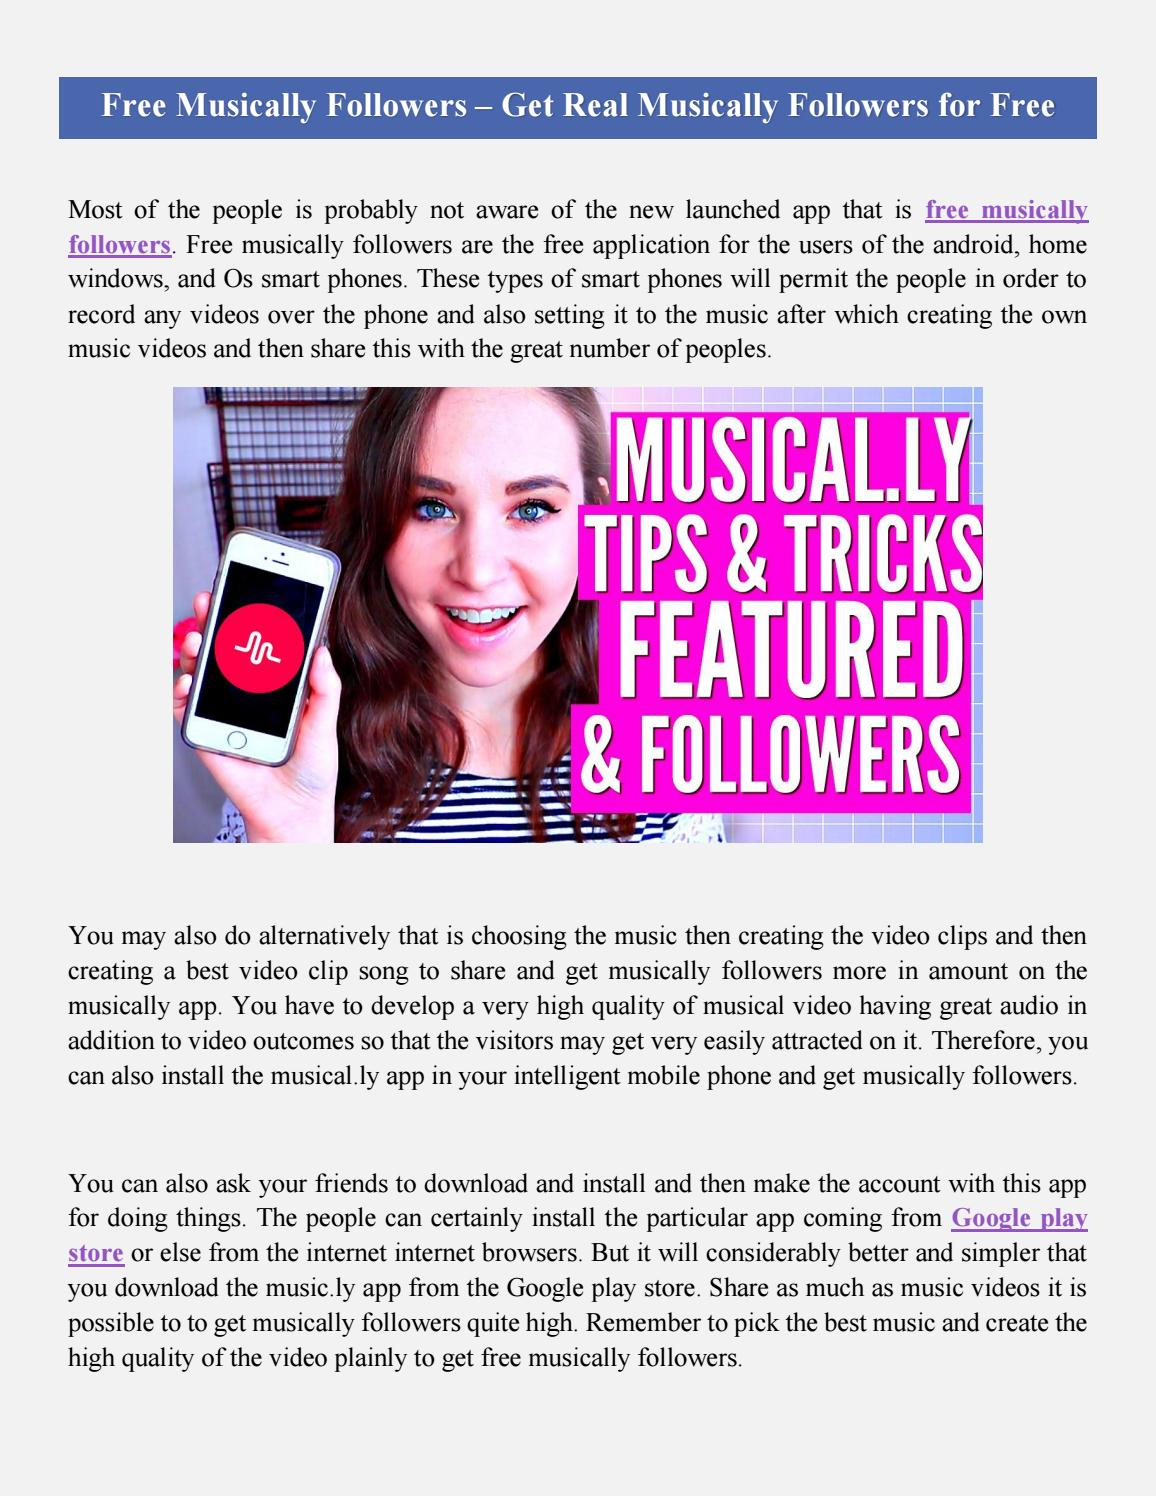 Free Musically Followers Pdf By Victoriawilsonn Issuu